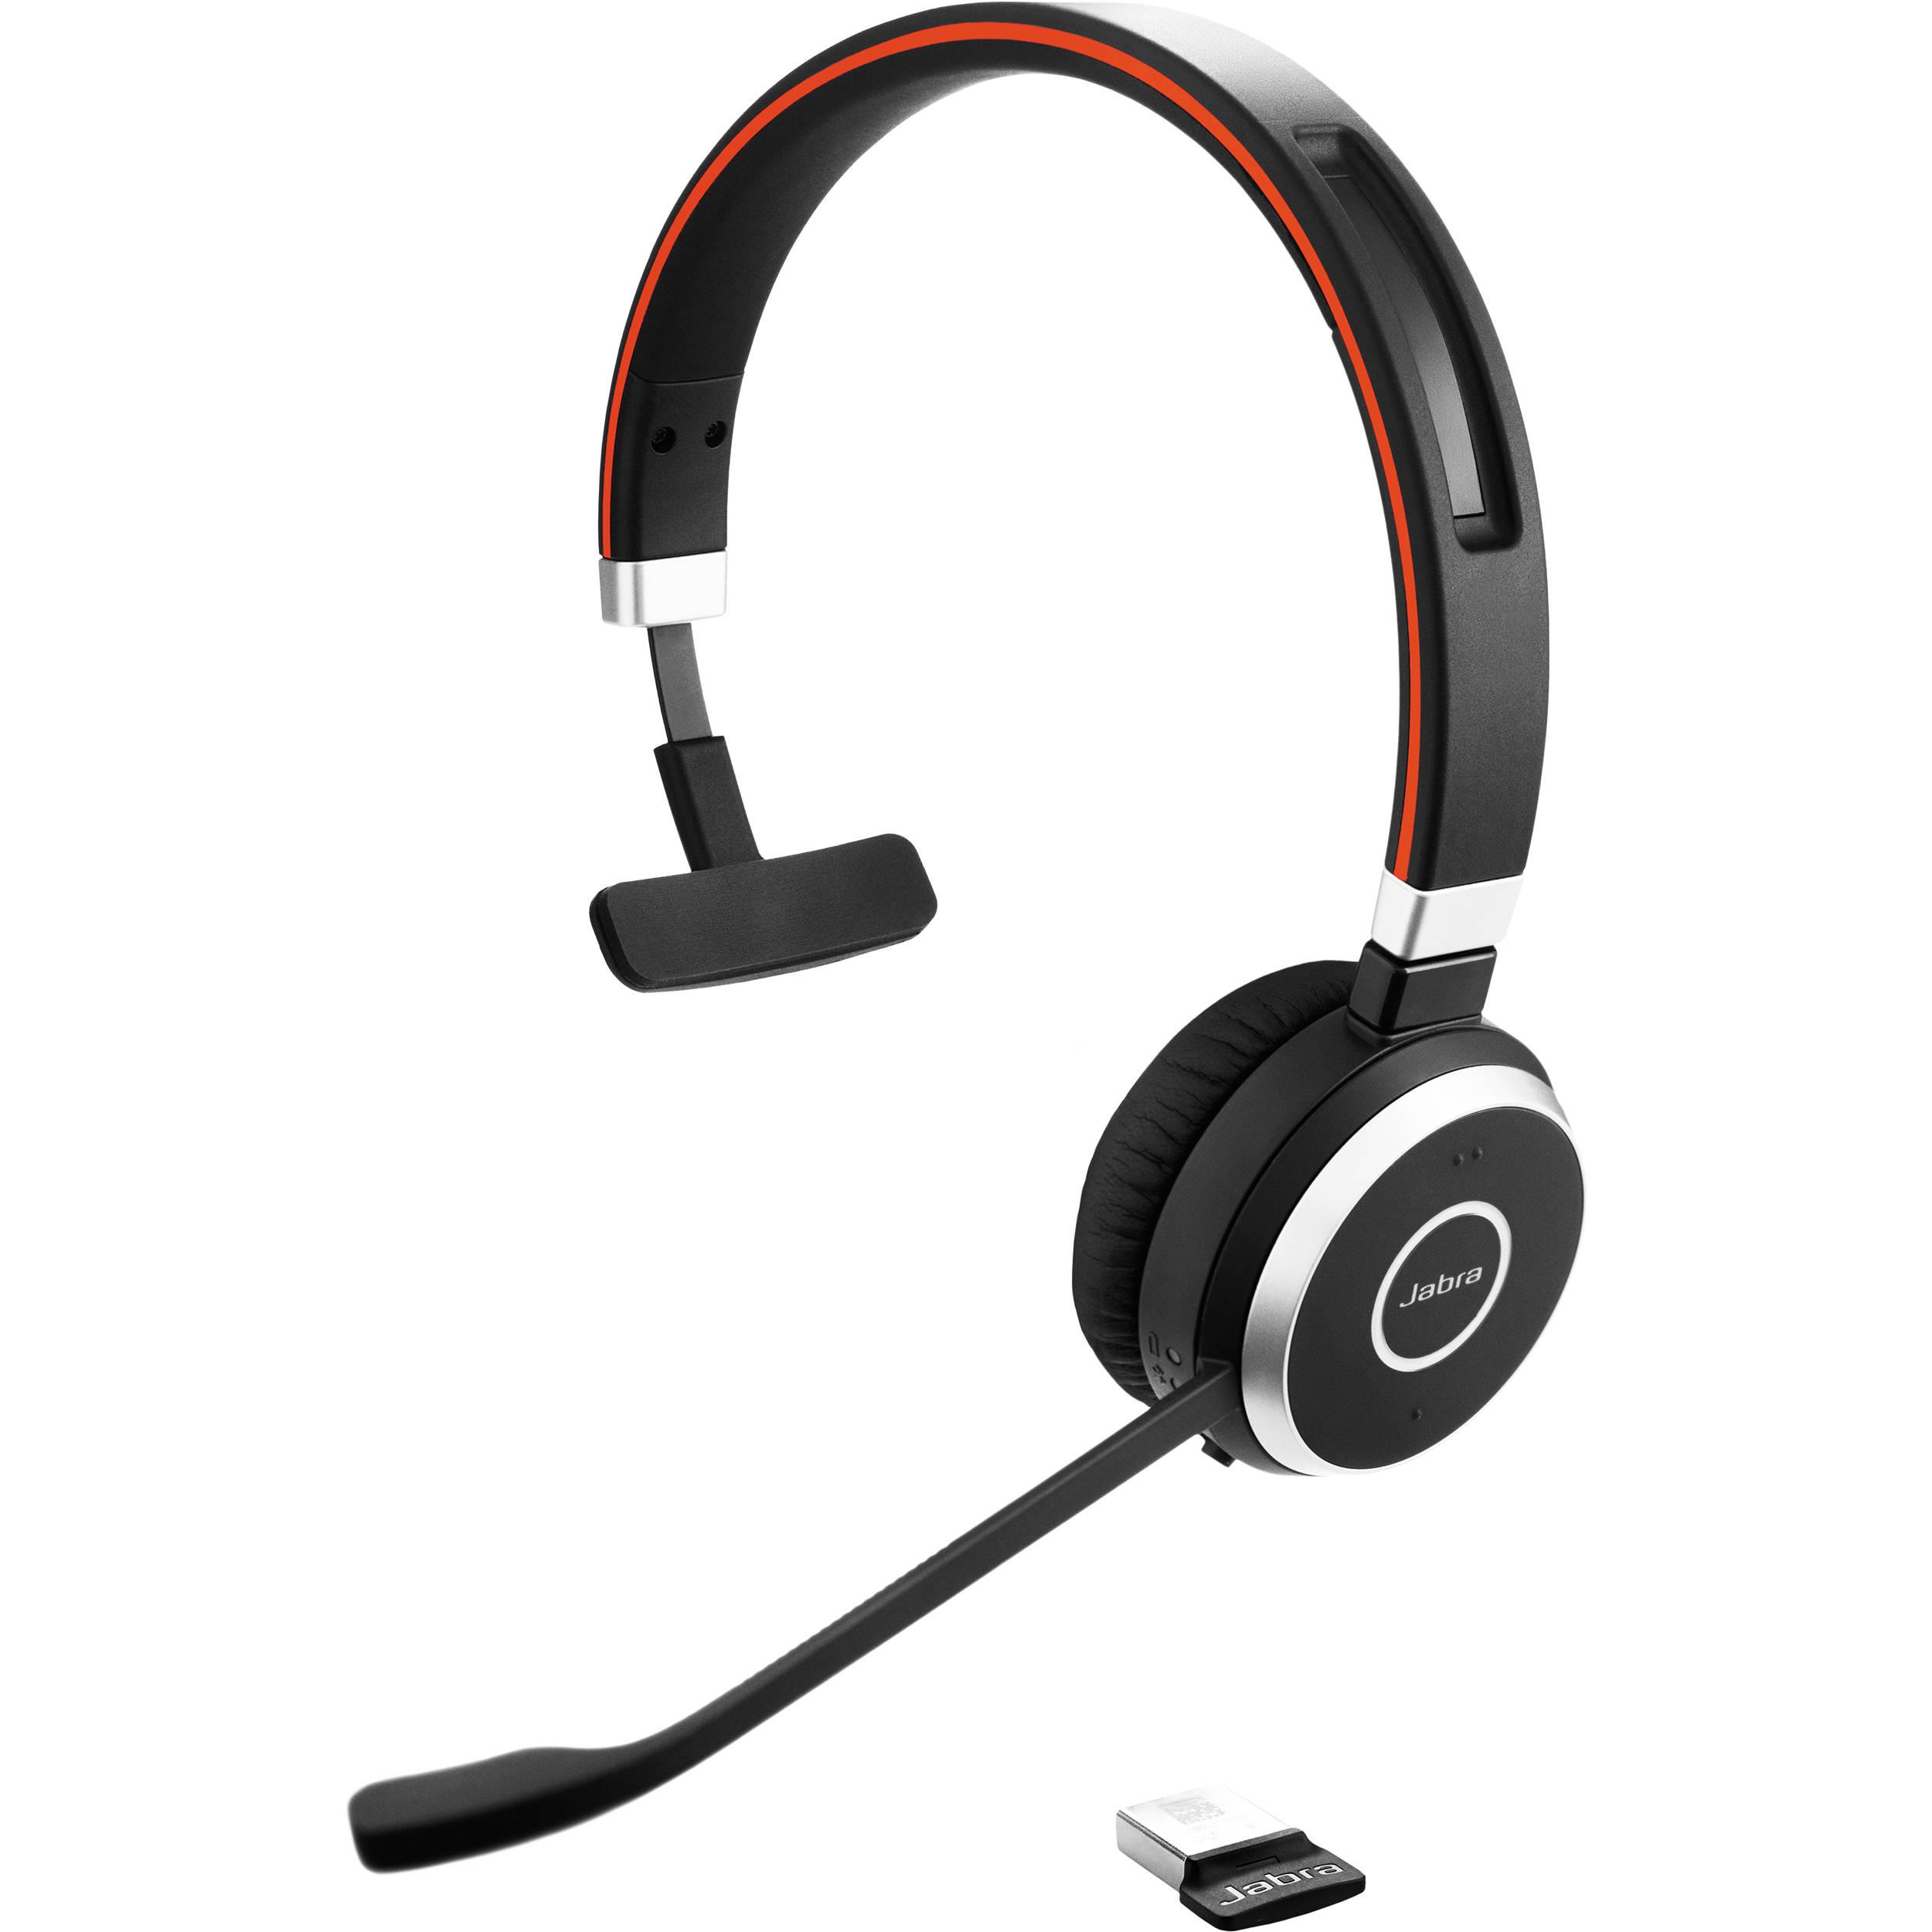 Jabra Evolve 65 UC mono - headset - with Jabra LINK 360 Adapter